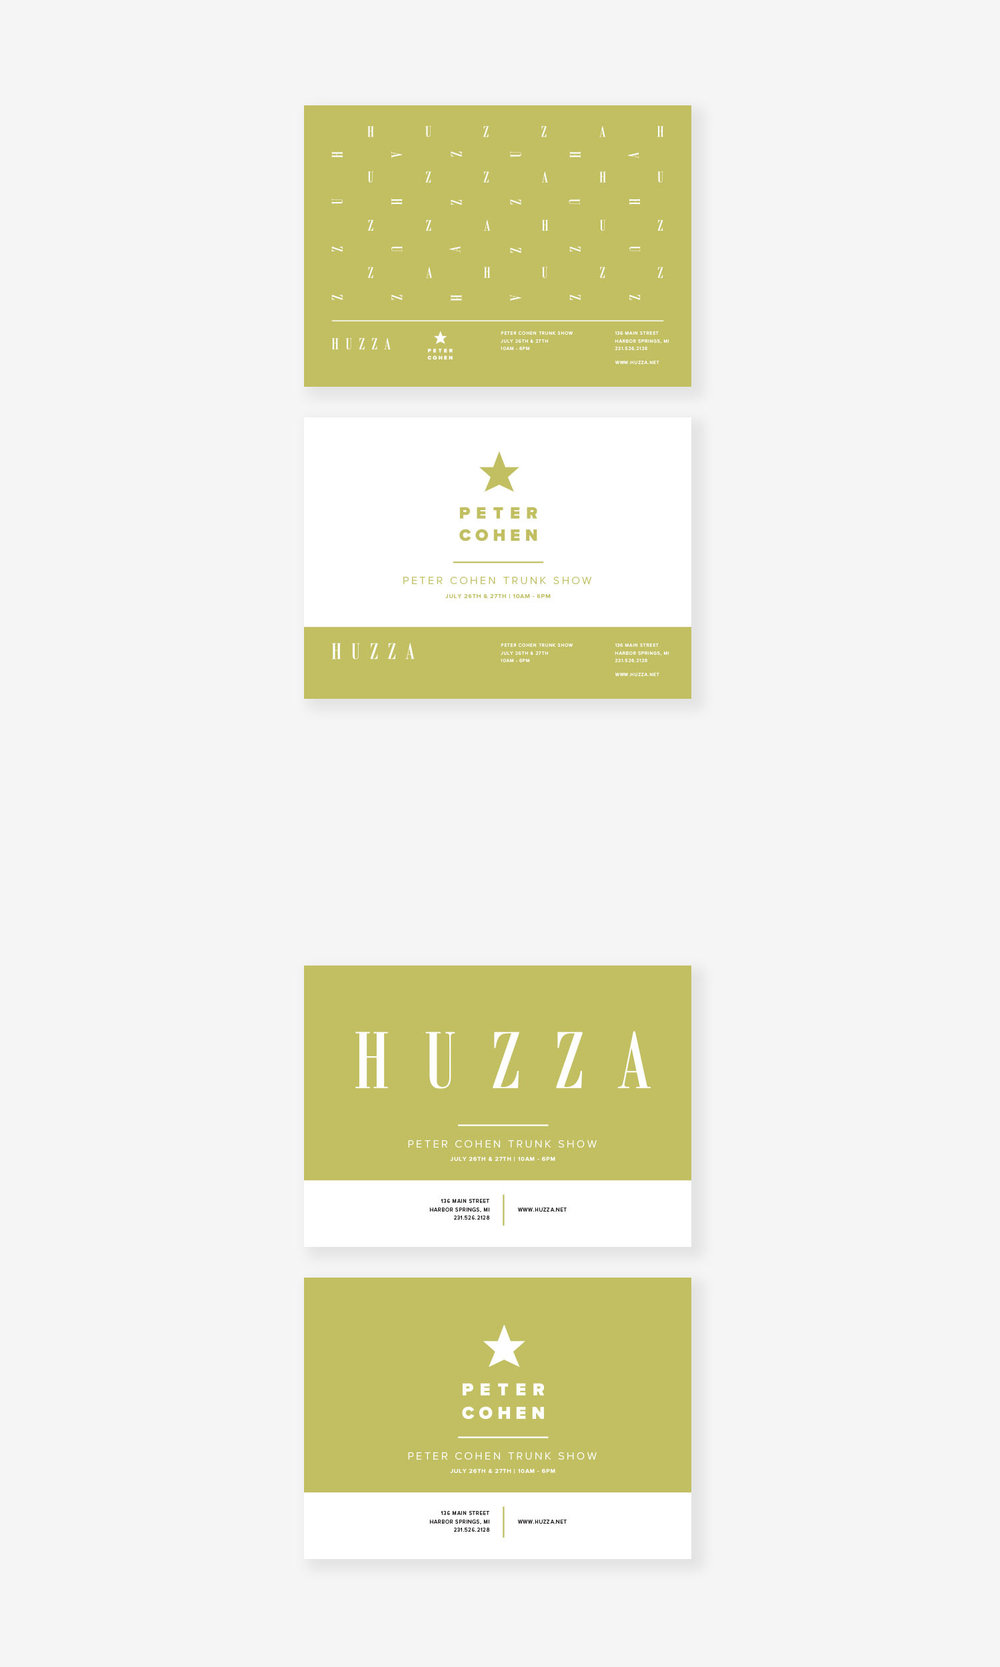 Huzza-Postcard-Print-Graphic-Visual-Design-Portland-Designer-Heather-Maehr.jpg